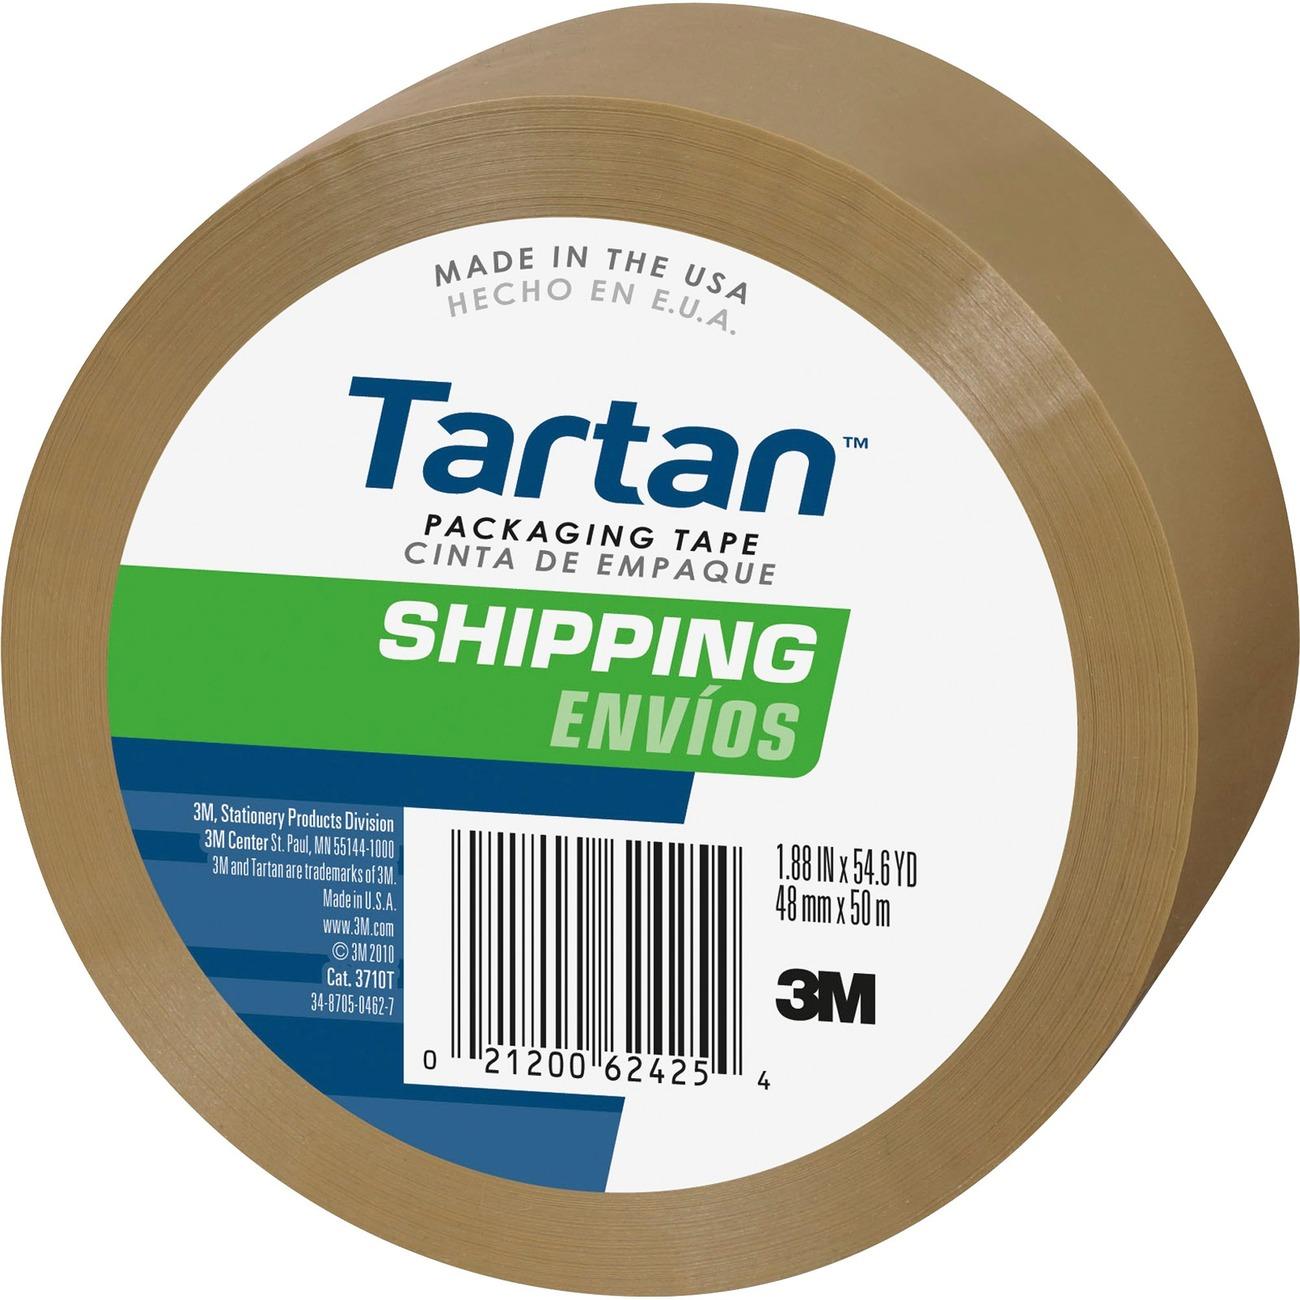 Tartan General Purpose Packaging Tape - 1 88